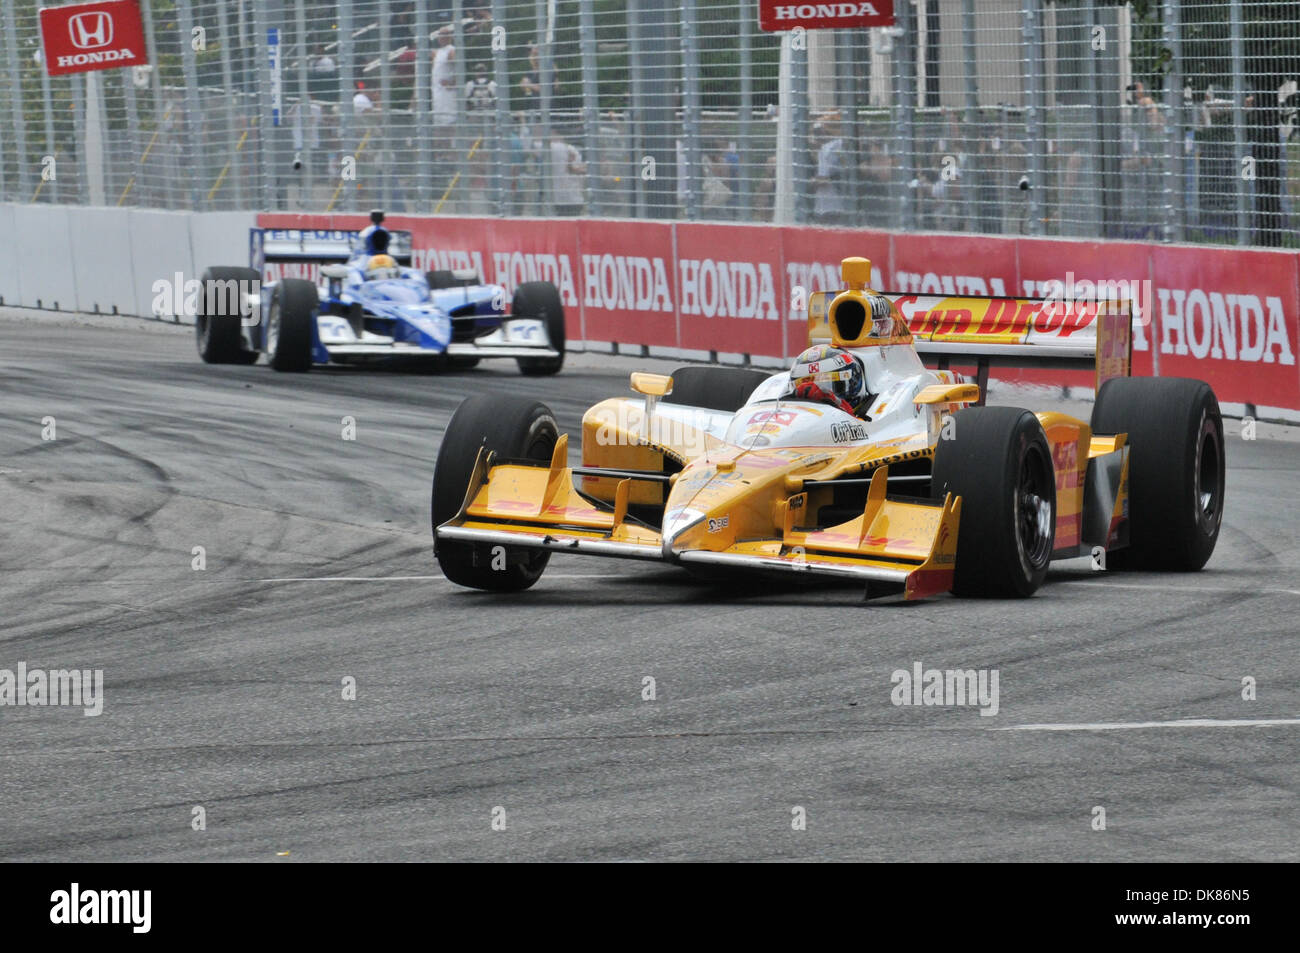 July 10, 2011 - Toronto, Ontario, Canada - Ryan Hunter-Reay driver of the #28 Team DHL/Circle K/Sun Drop Citrus Stock Photo